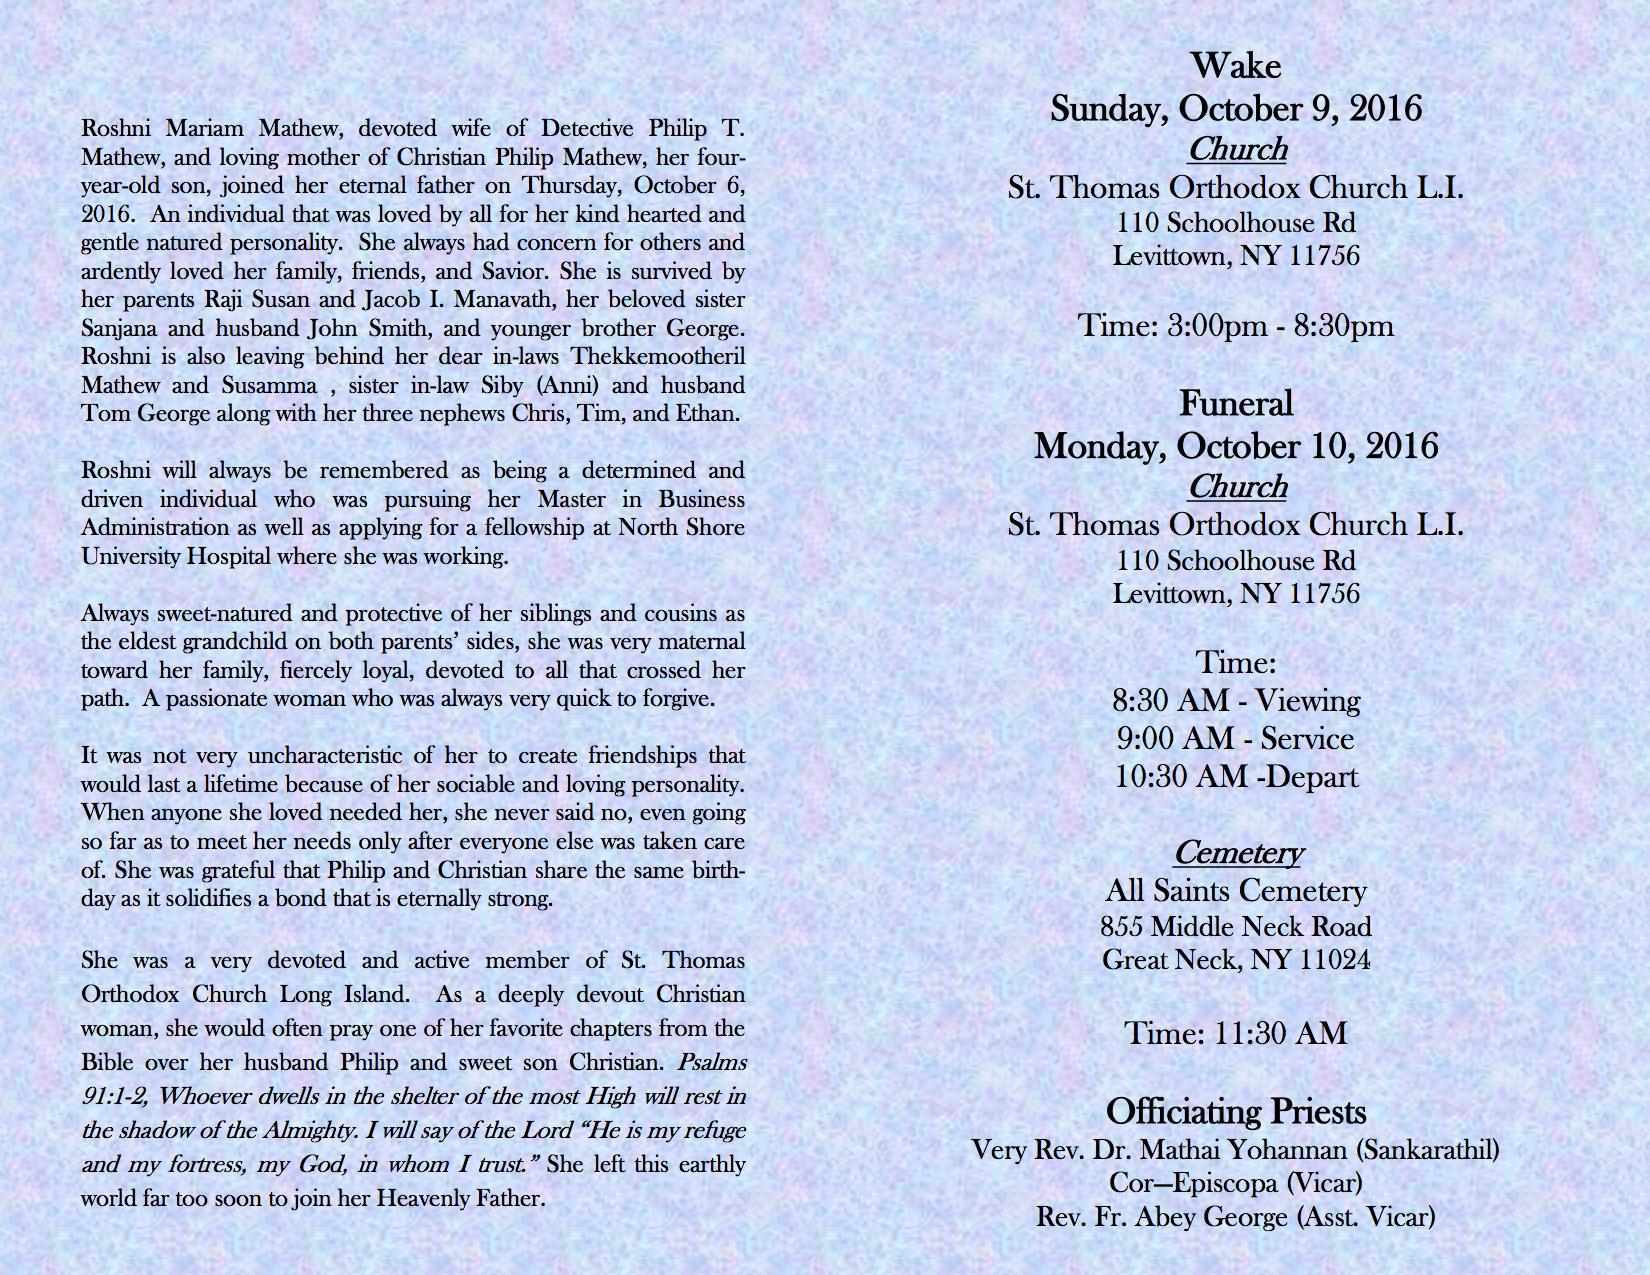 roshini-mathew-obituary-final-2